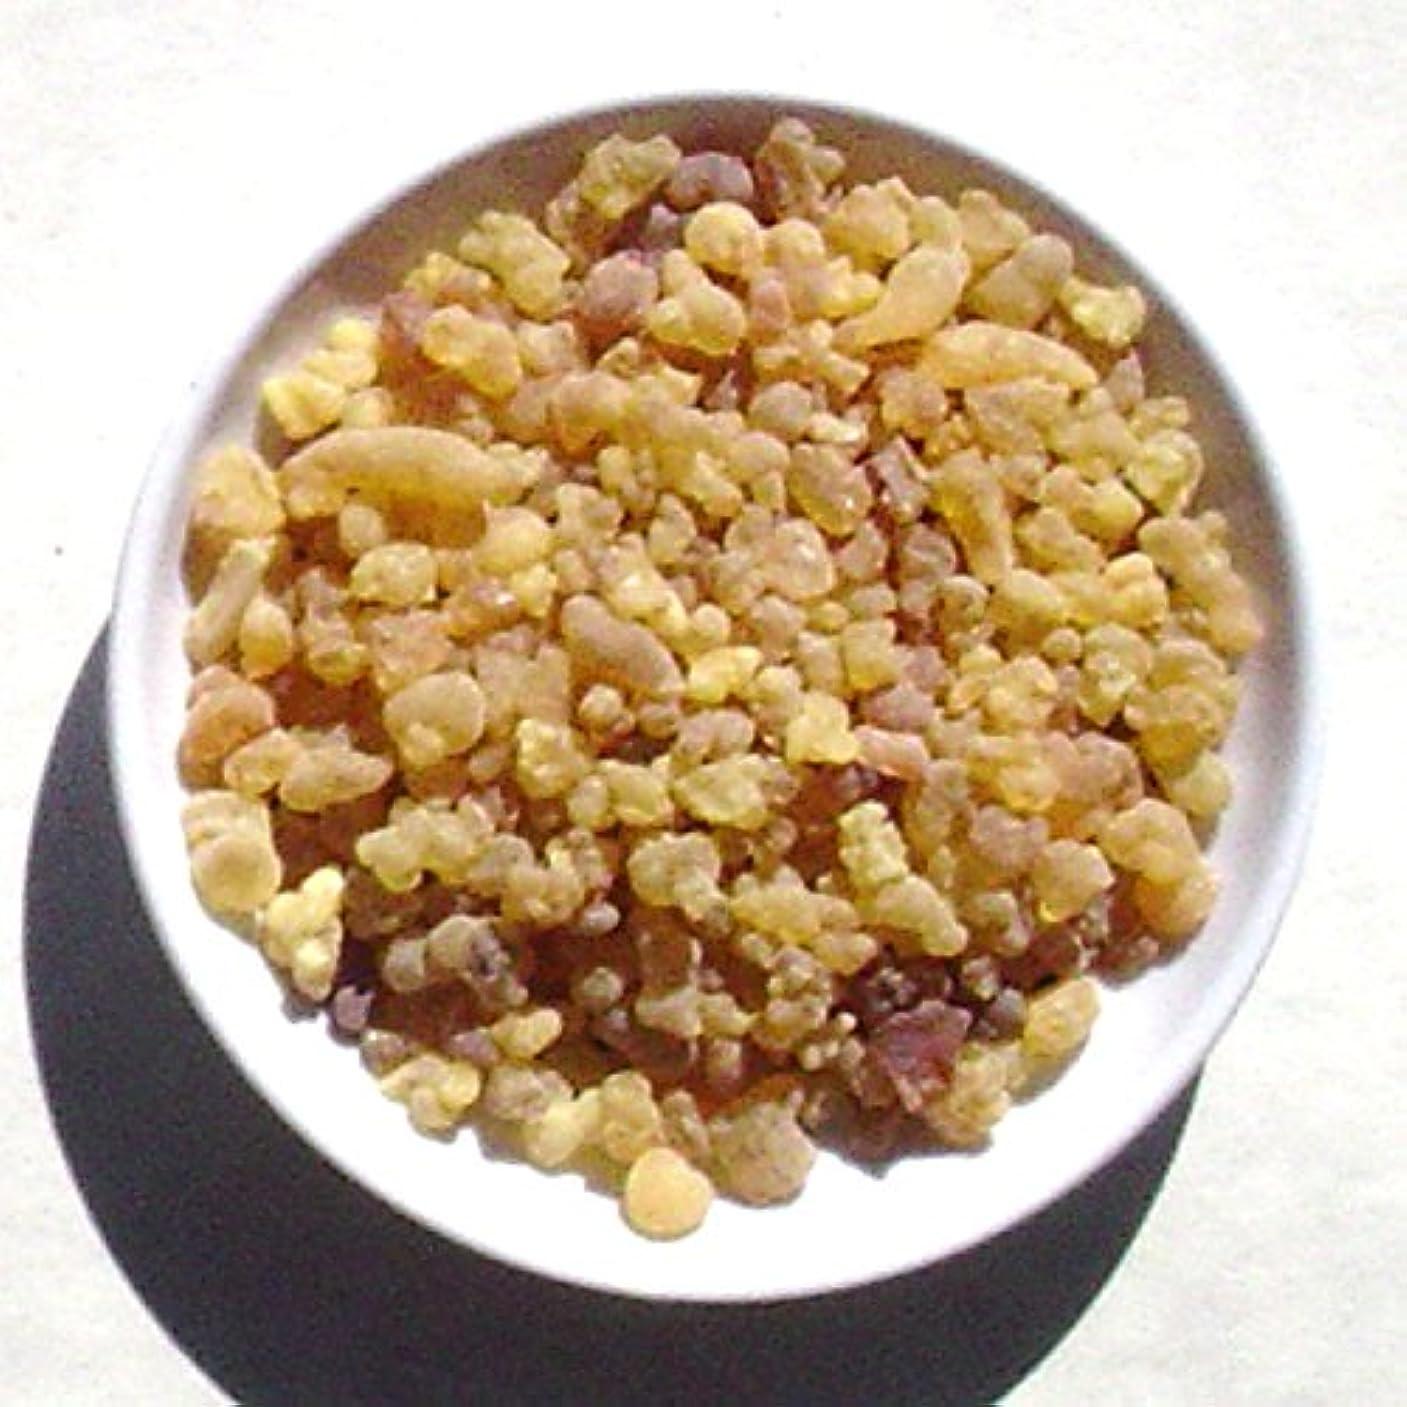 Arabian Frankincense – 1ポンド – Traditional Incense (樹脂)バルク